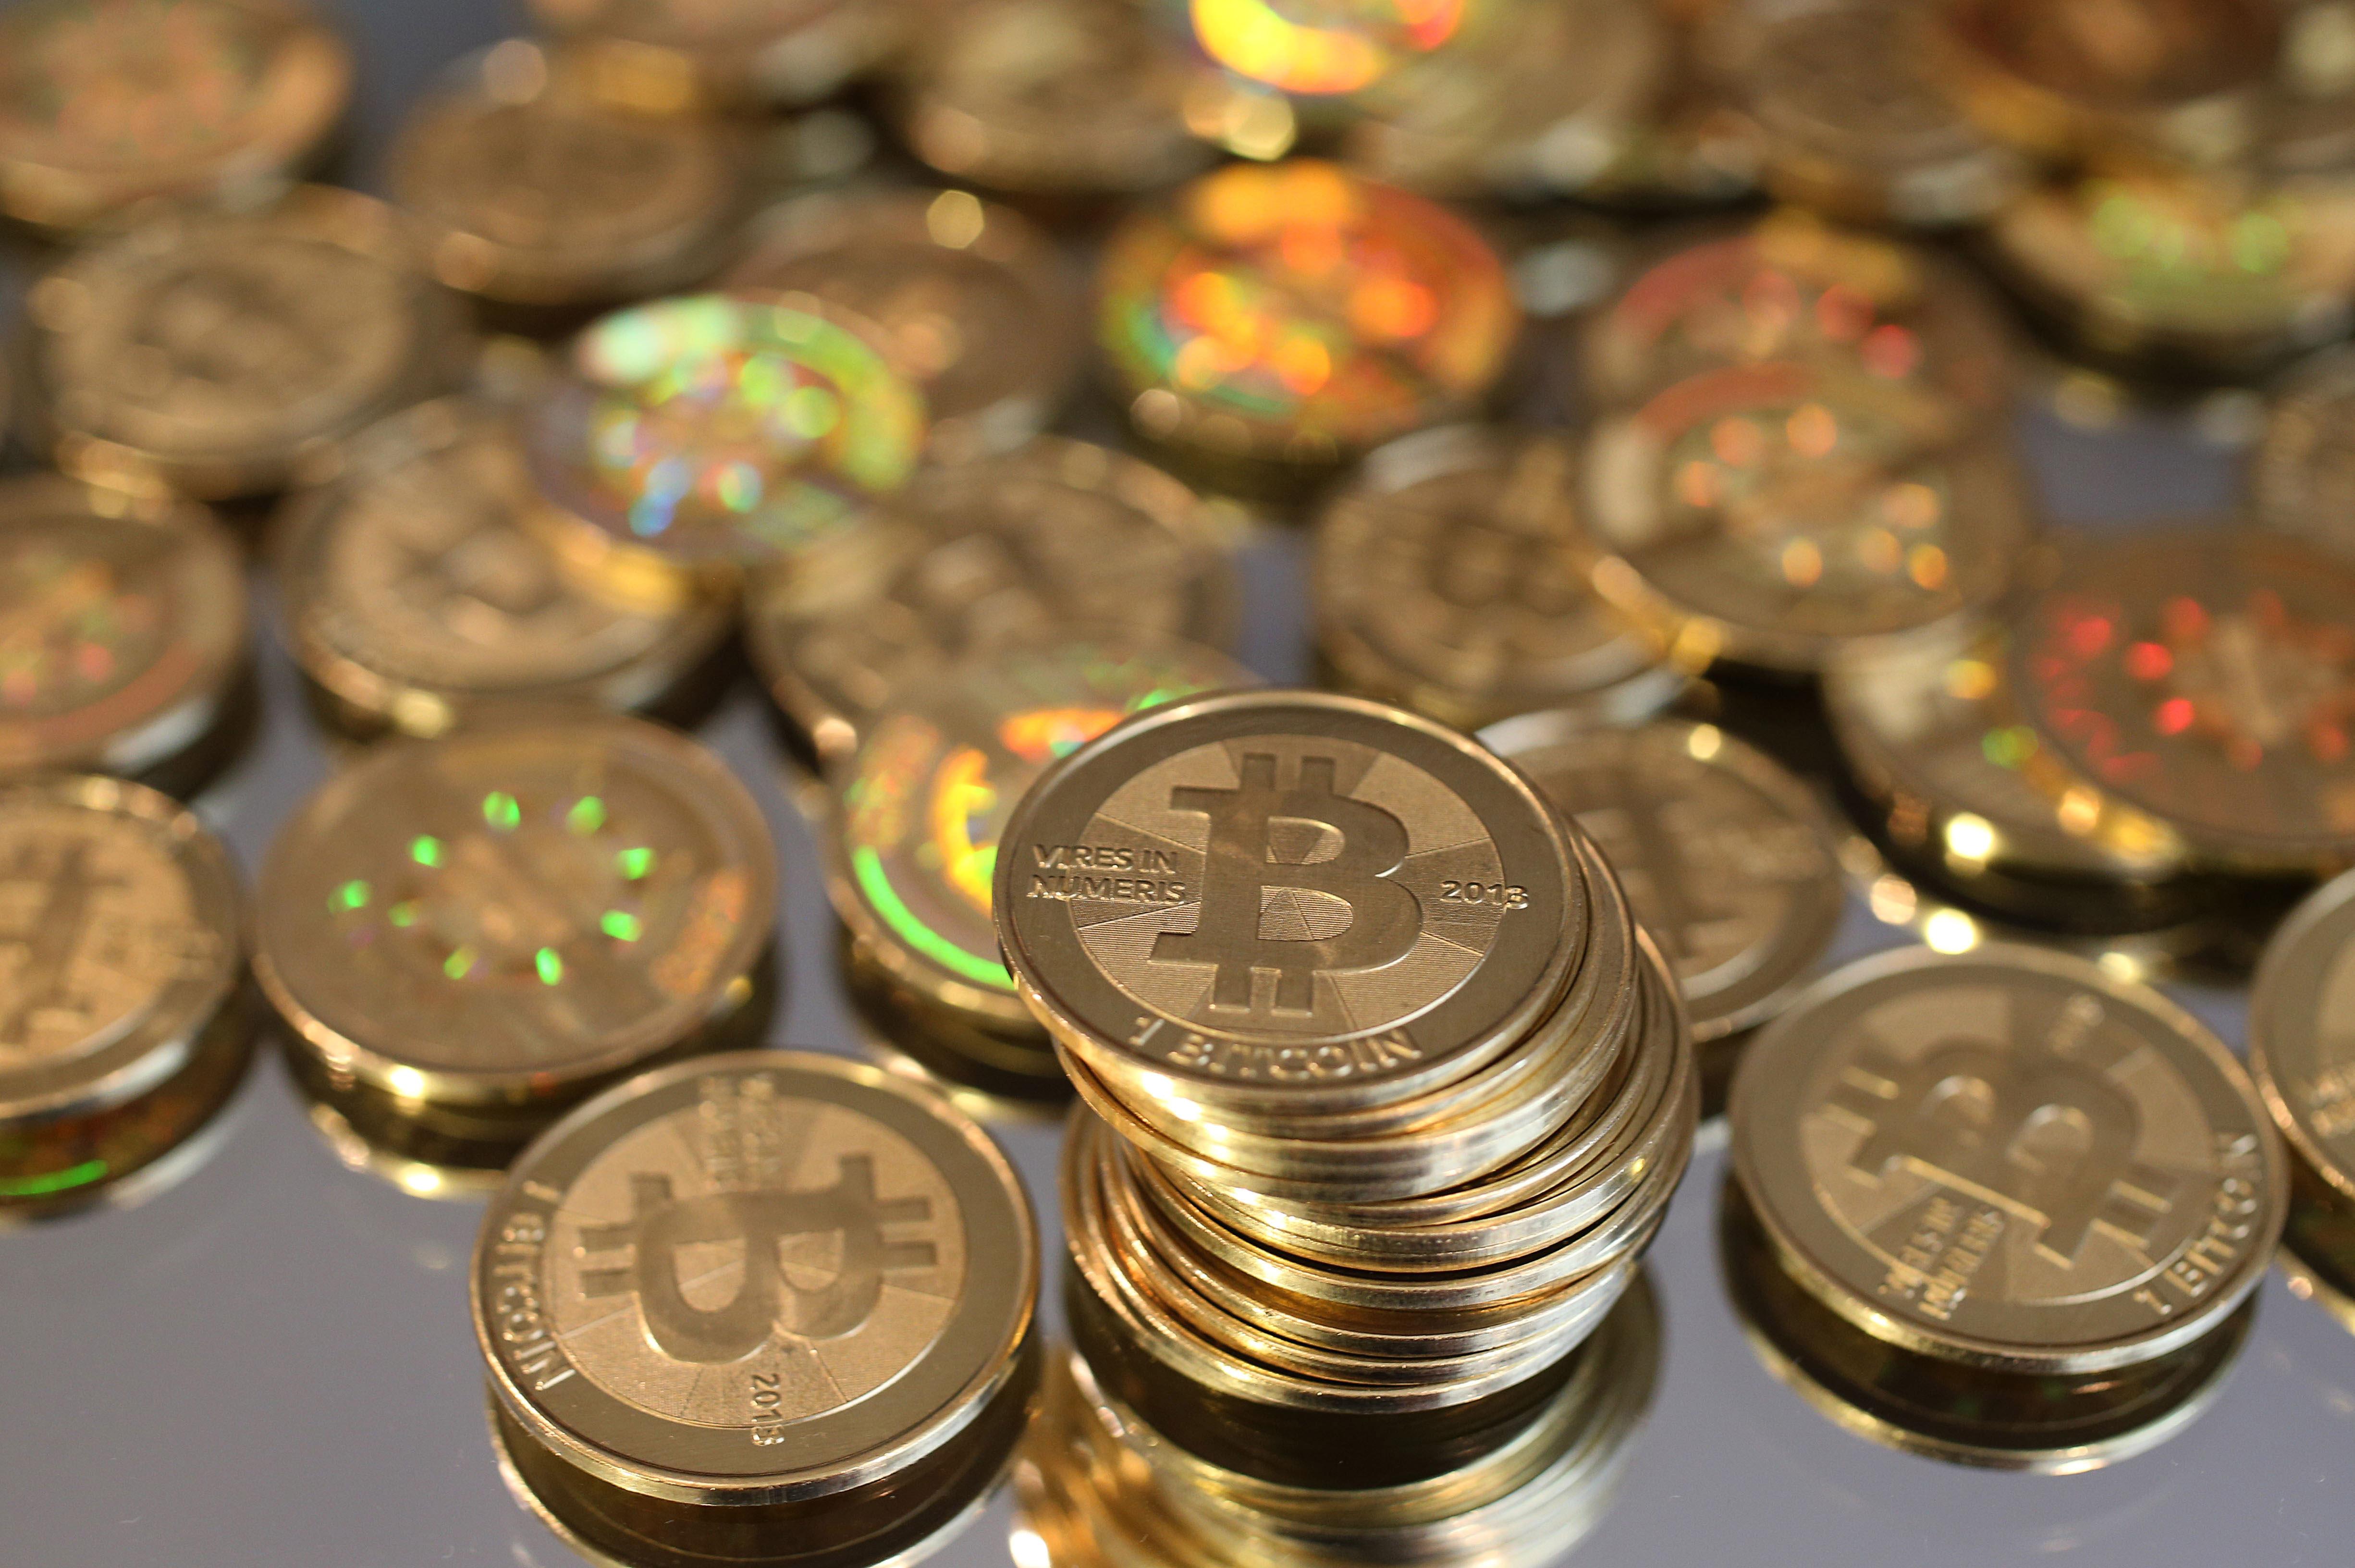 Bitcoin Digital Wallet Service Coinbase has had its iOS App Pulled